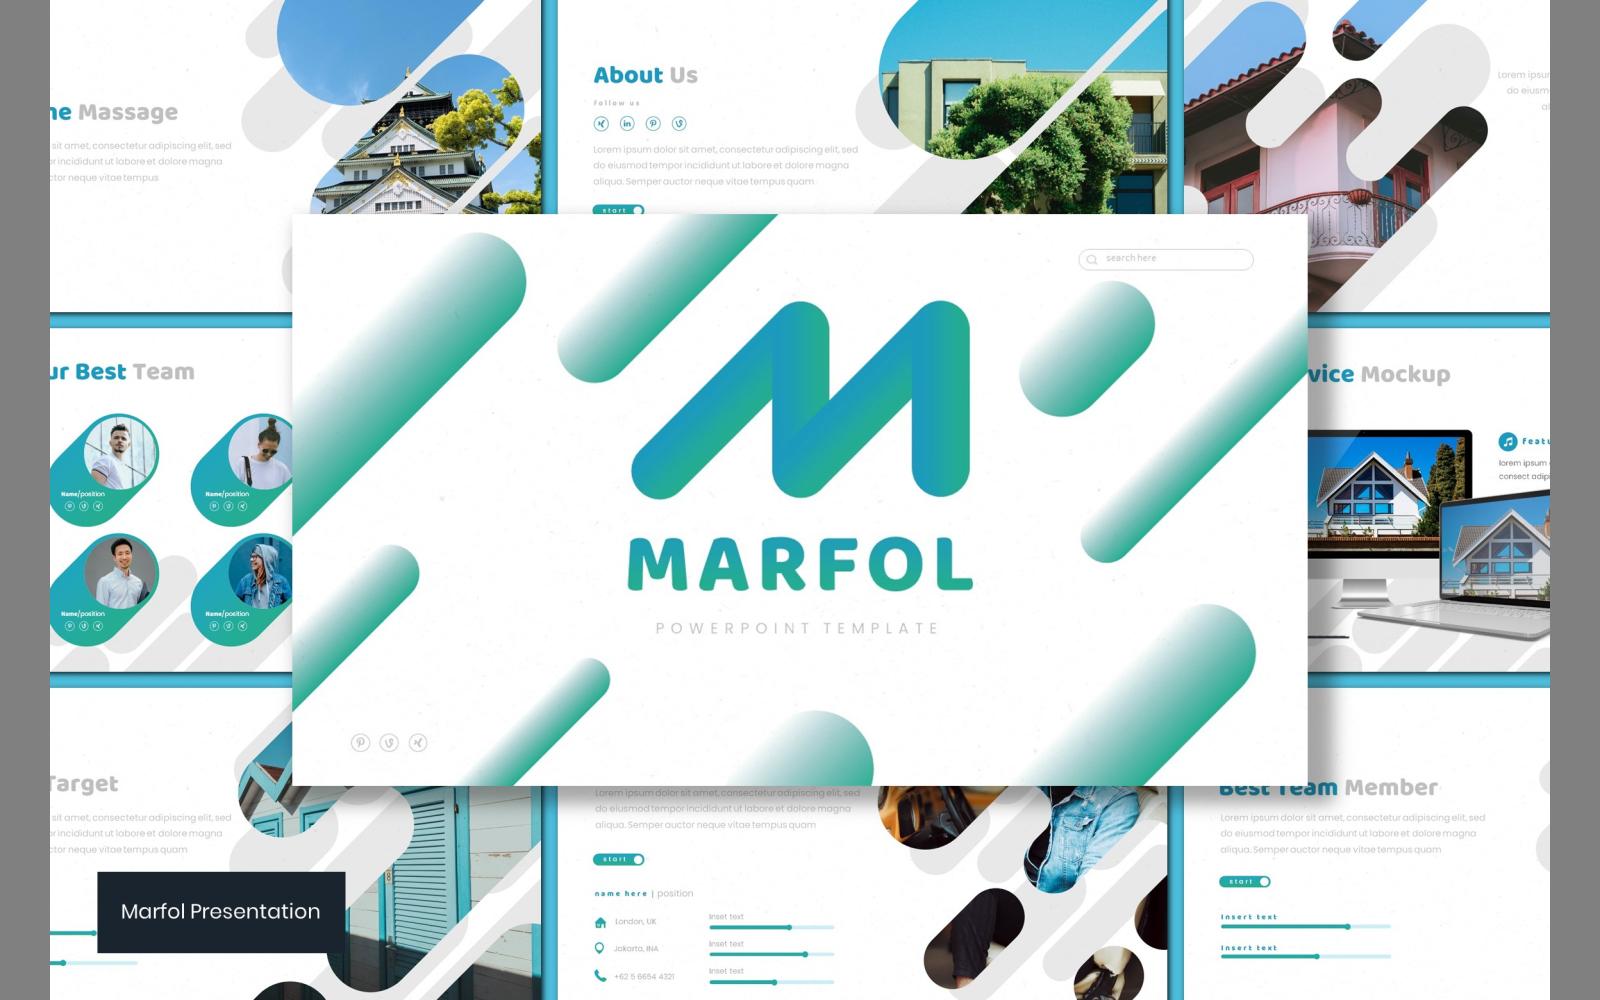 Marfol PowerPoint Template